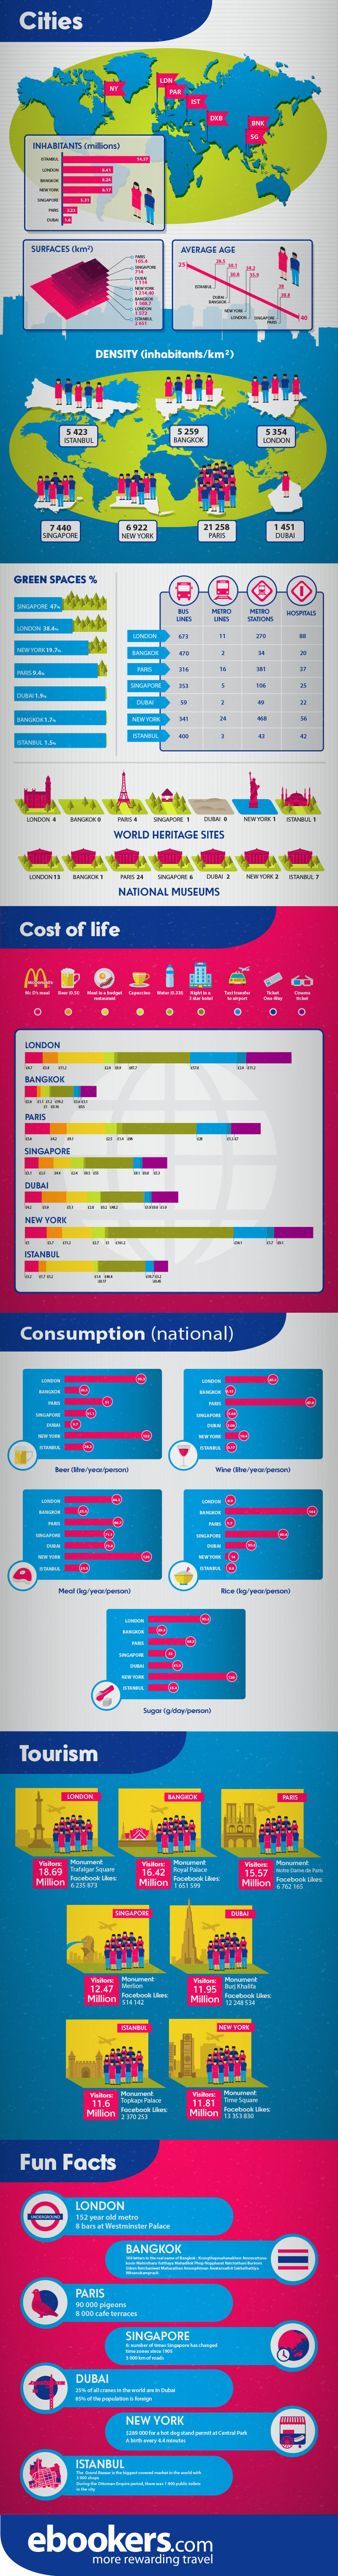 comparing mega cities infographic